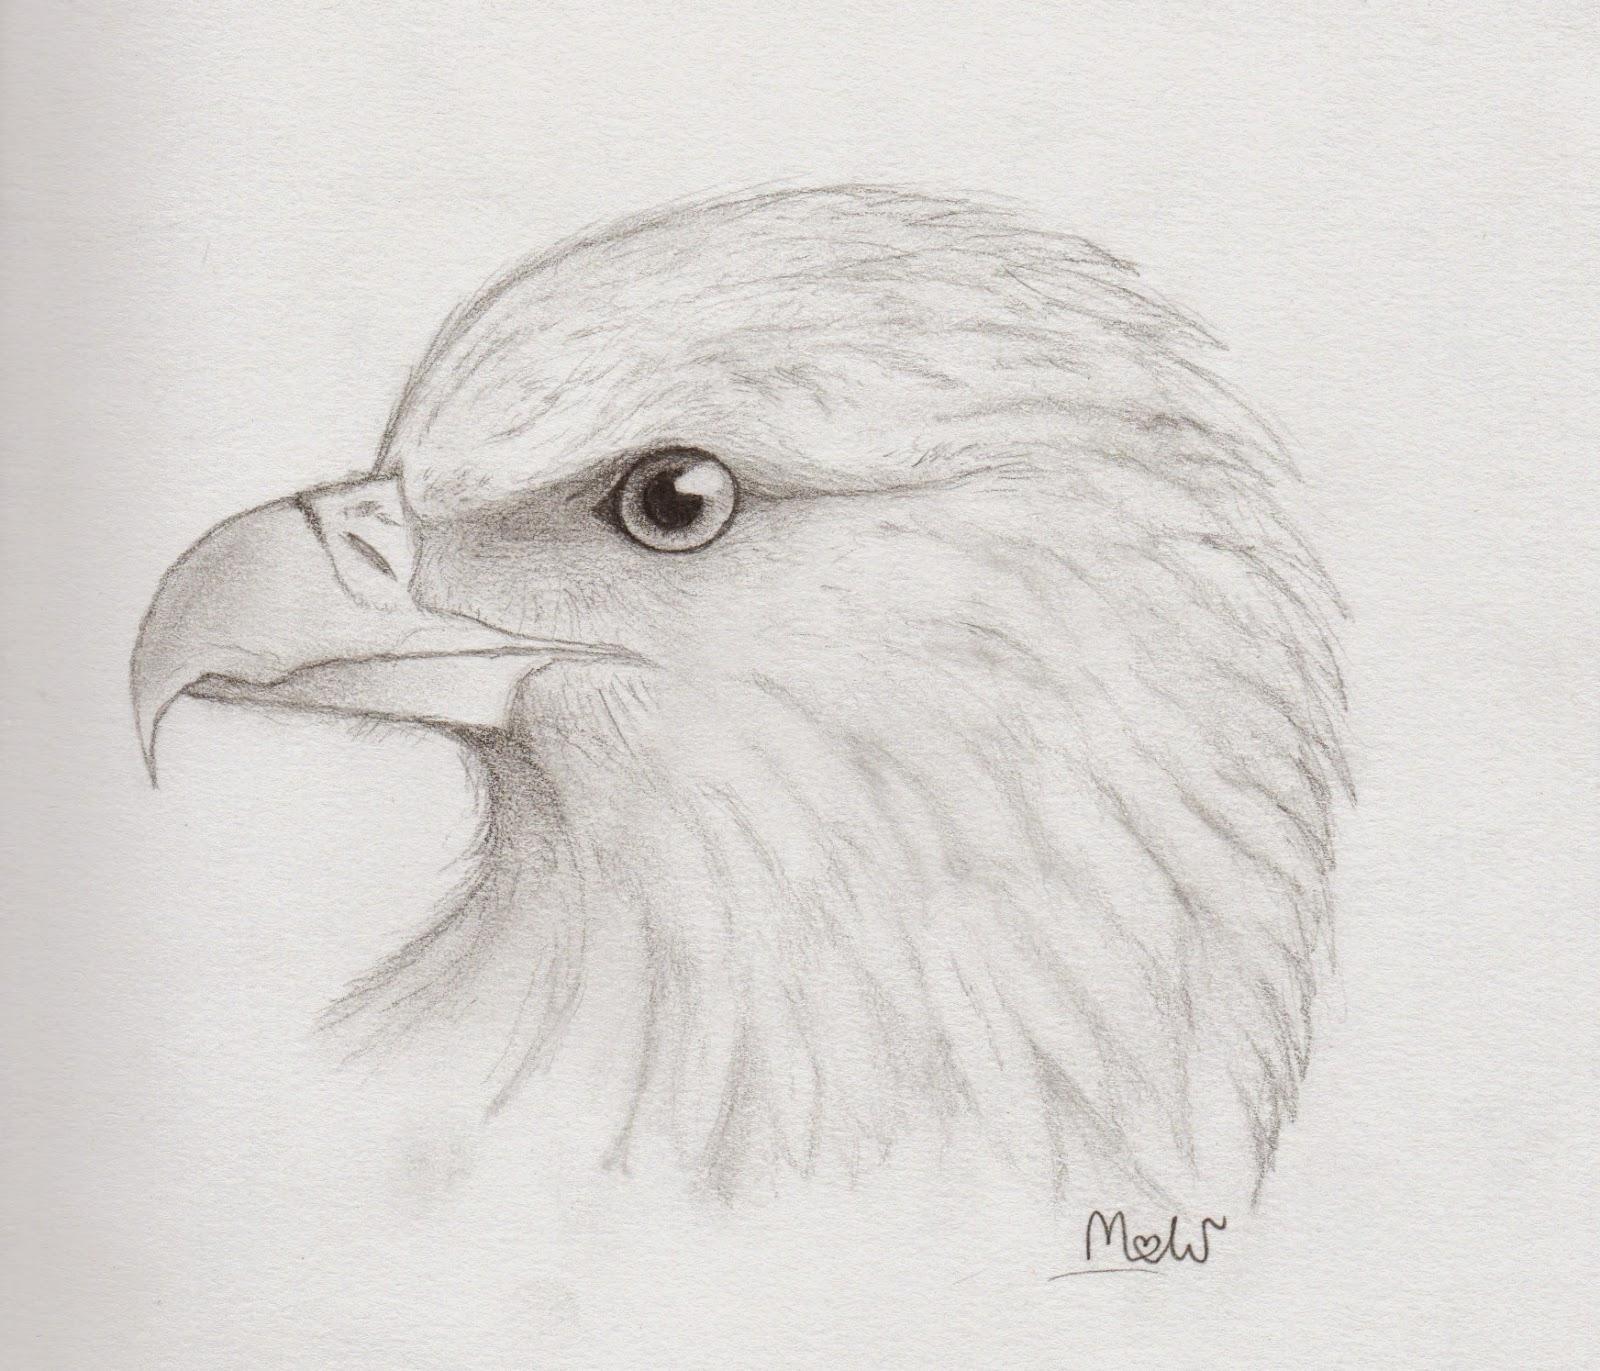 Ptasimi śladami Rysunki